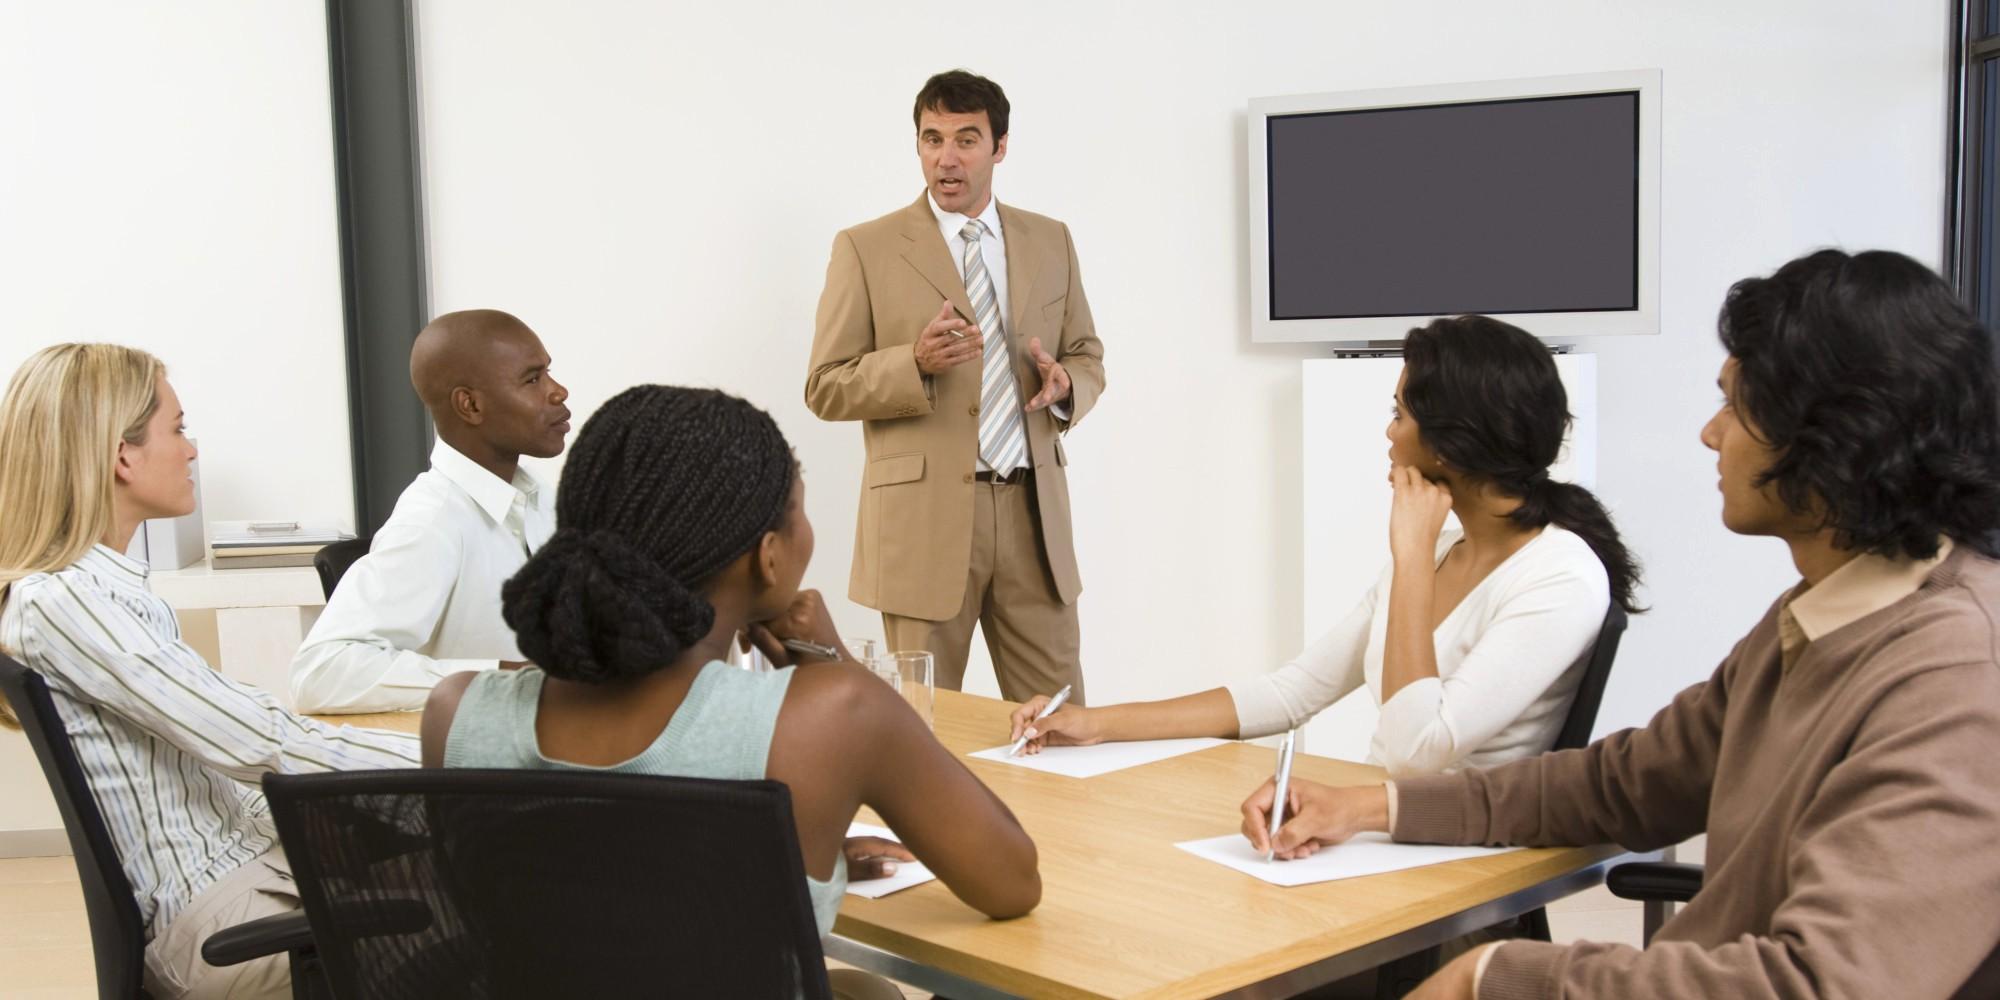 At Meeting or In Meeting Luxury 10 Tricks to Appear Smart During Meetings